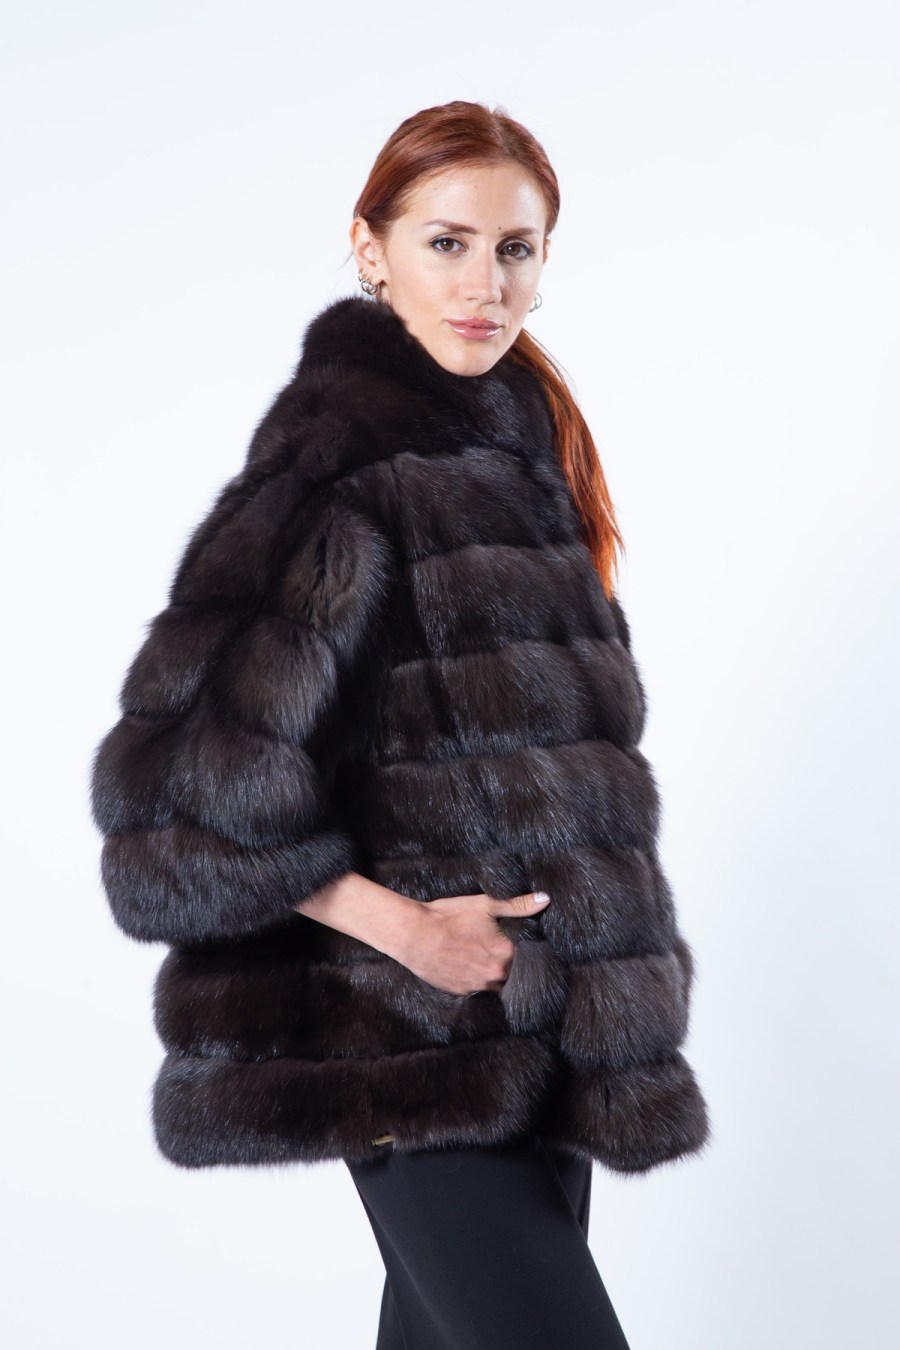 Barguzin Sable Jacket with 7/8 Sleeves | Sarigianni Furs